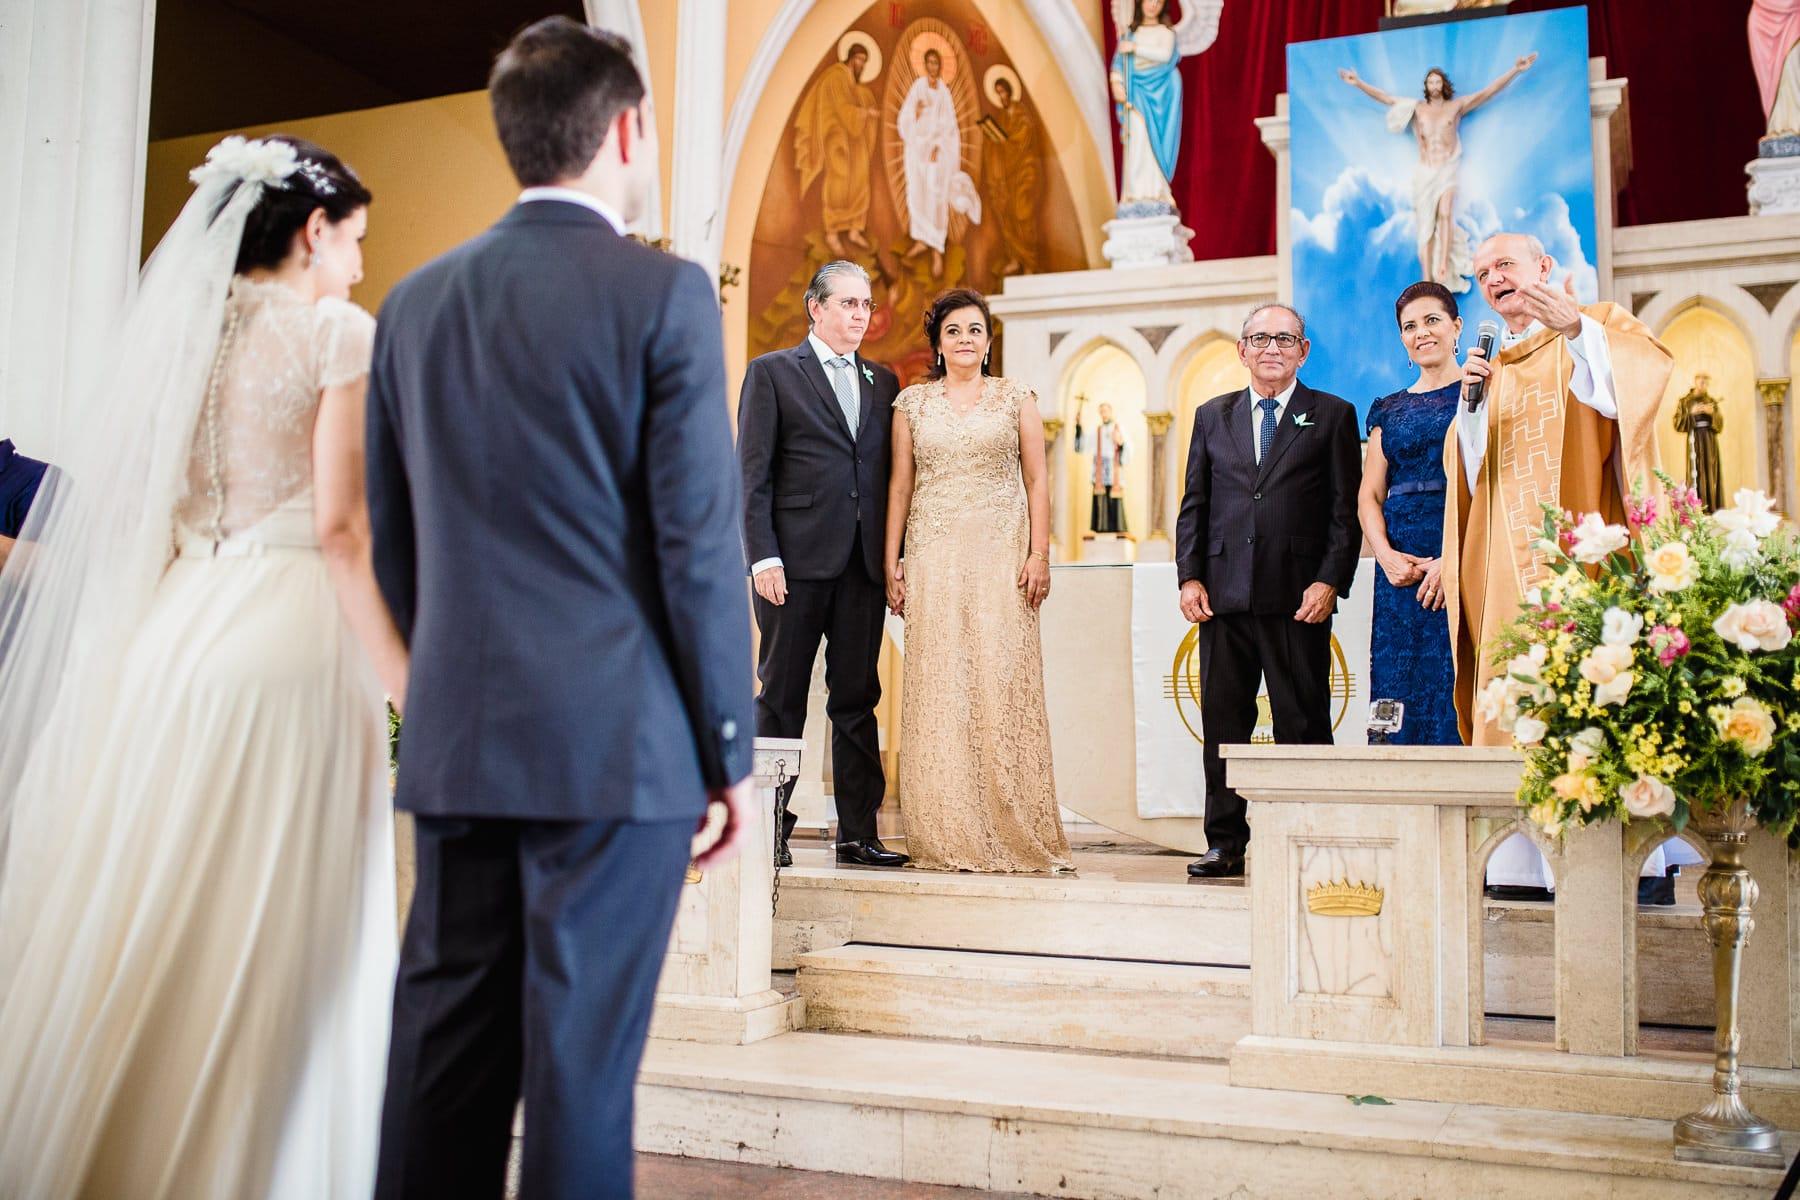 casamento-igreja-do-cristo-rei-fortaleza-28